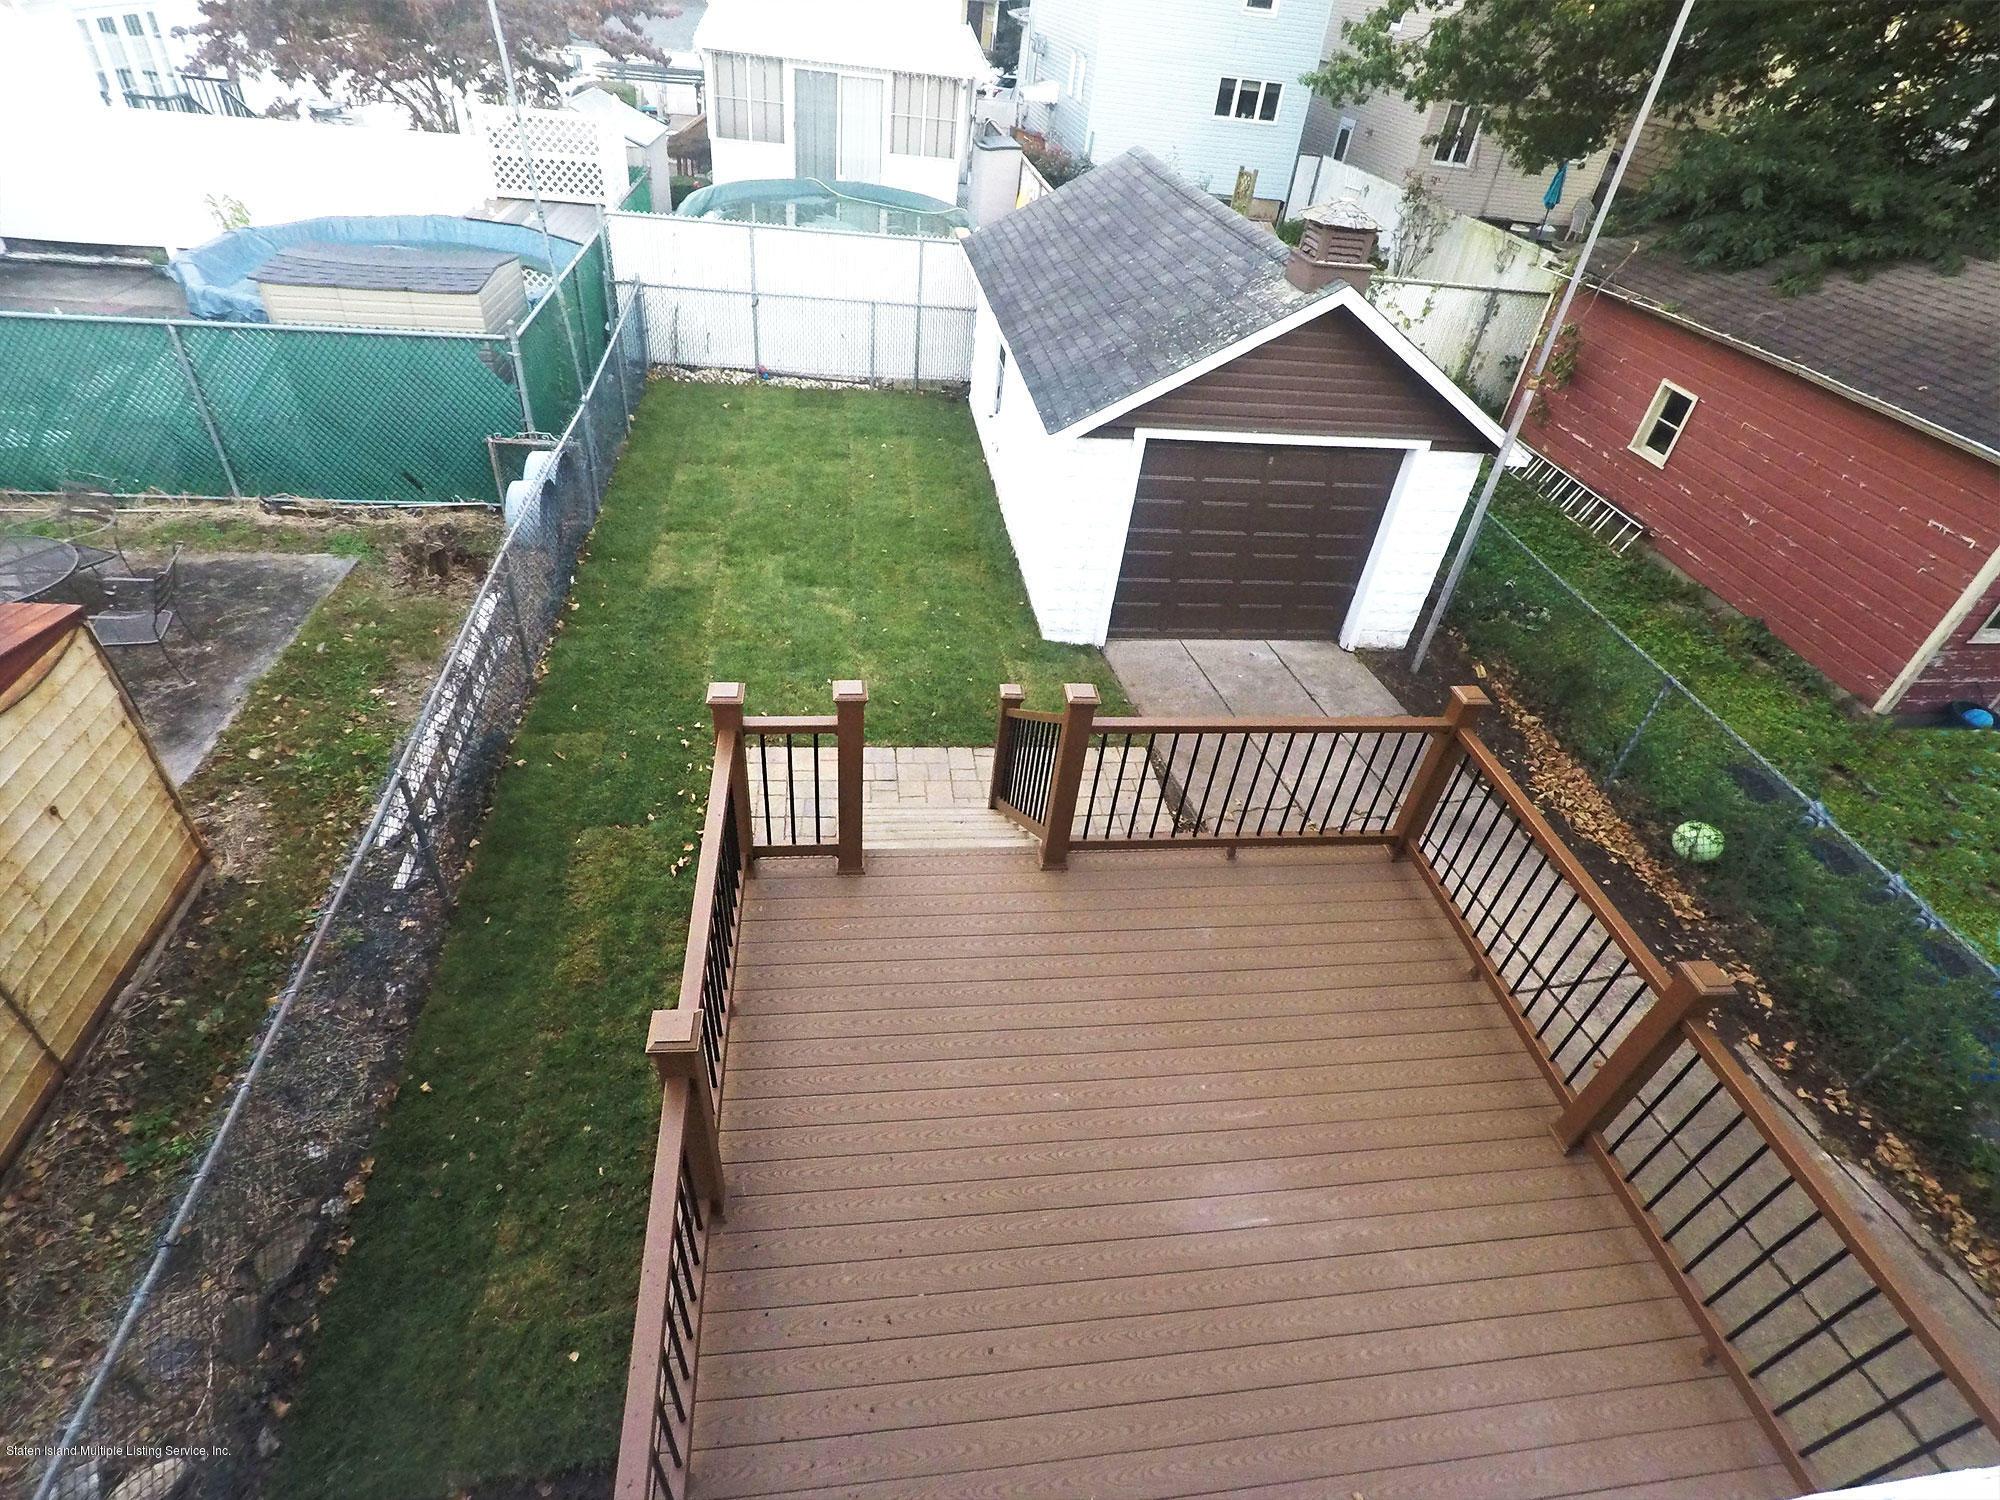 Single Family - Detached 115 Woodbine Avenue  Staten Island, NY 10314, MLS-1123689-38